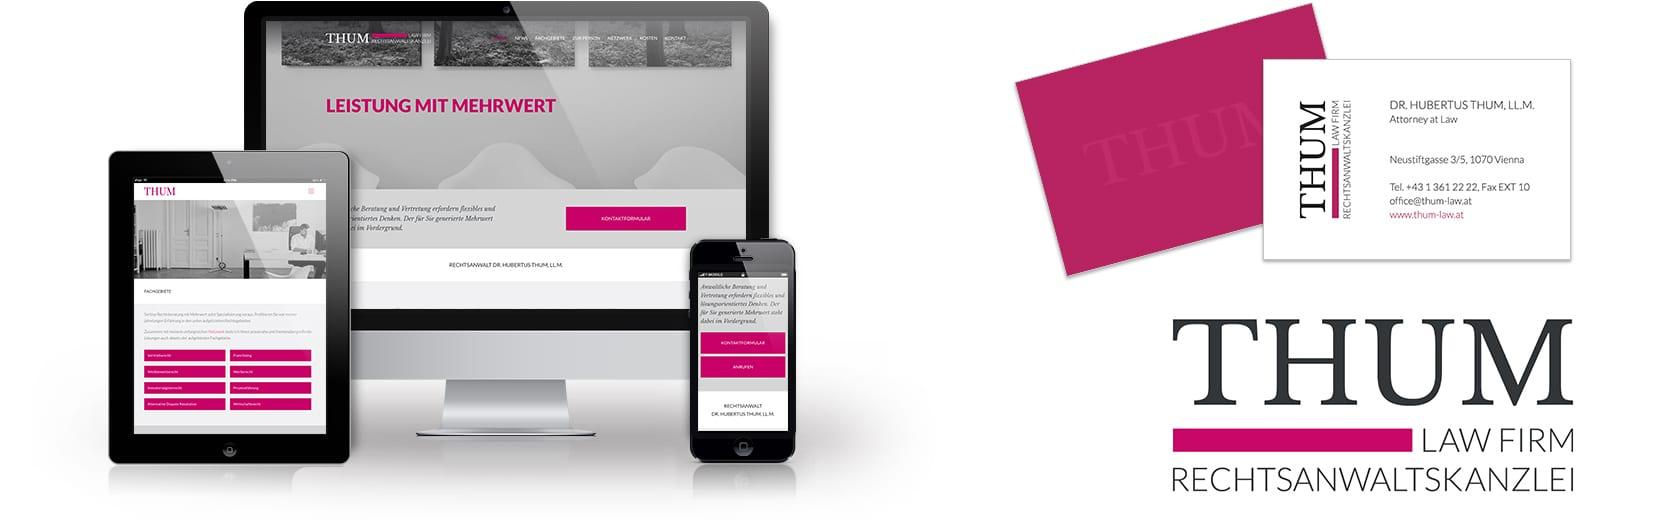 Homepage für Rechtsanwalt erstellen lassen Wien